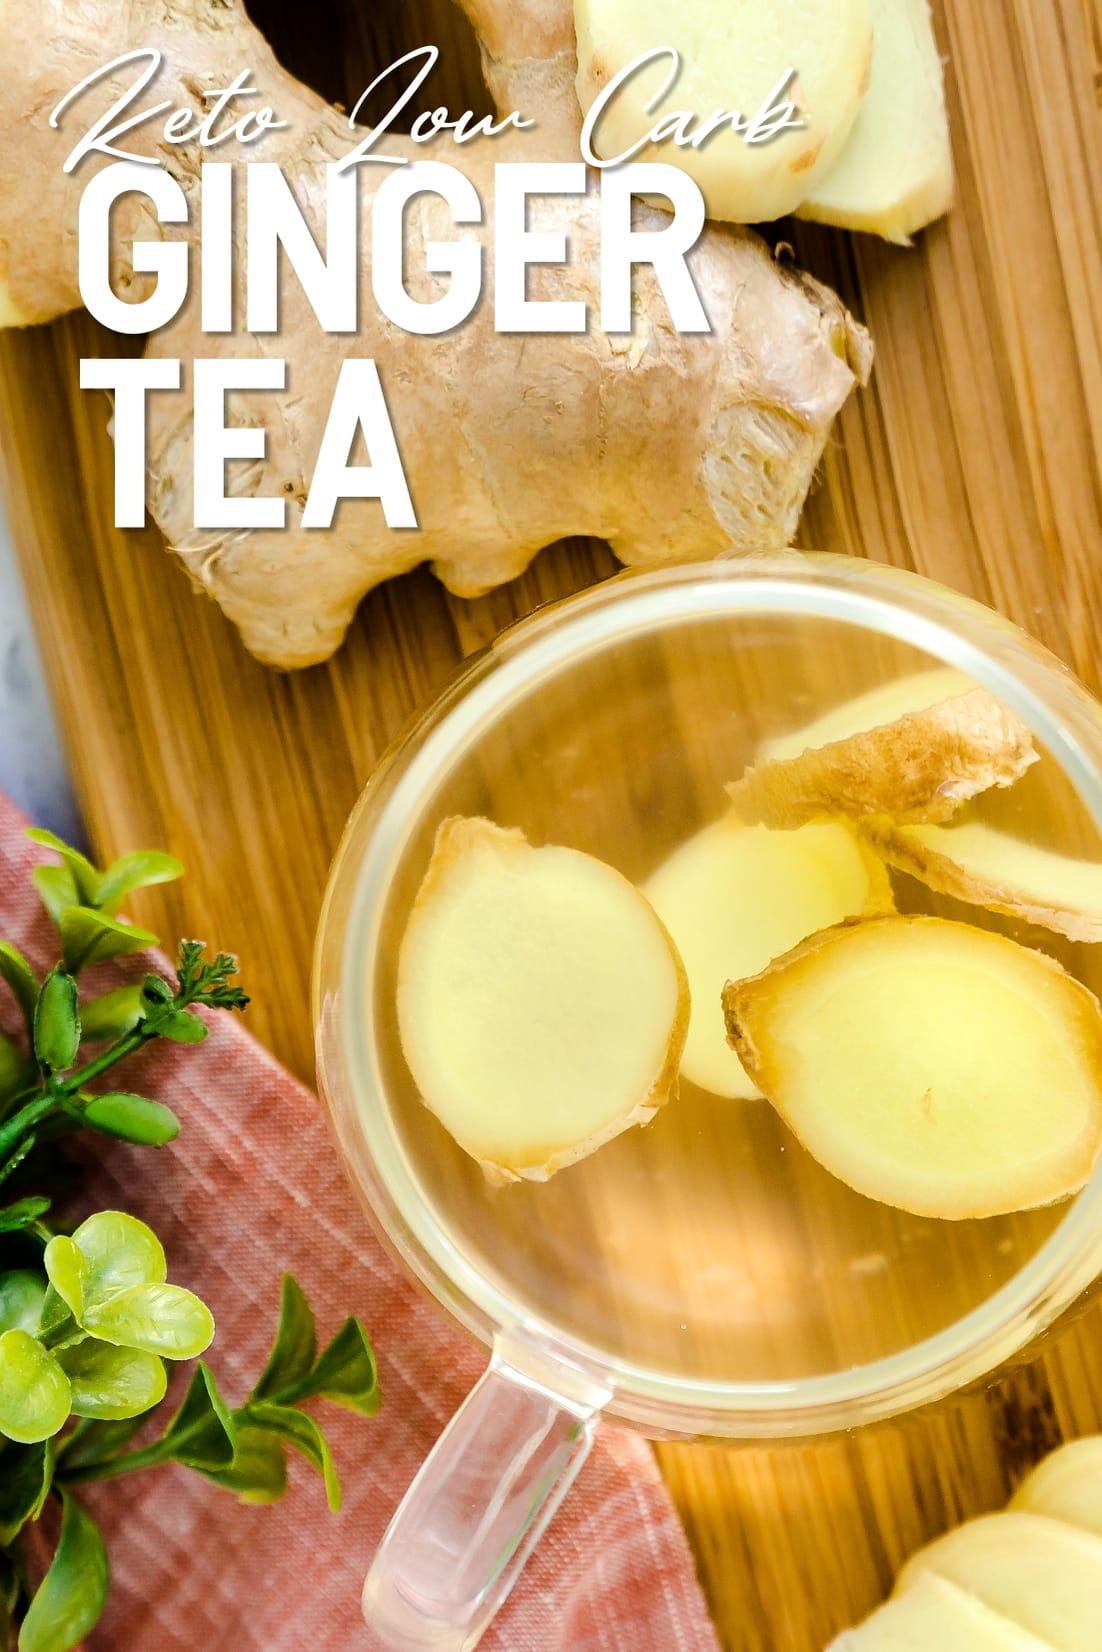 Keto Ginger Tea served inside a glass cup